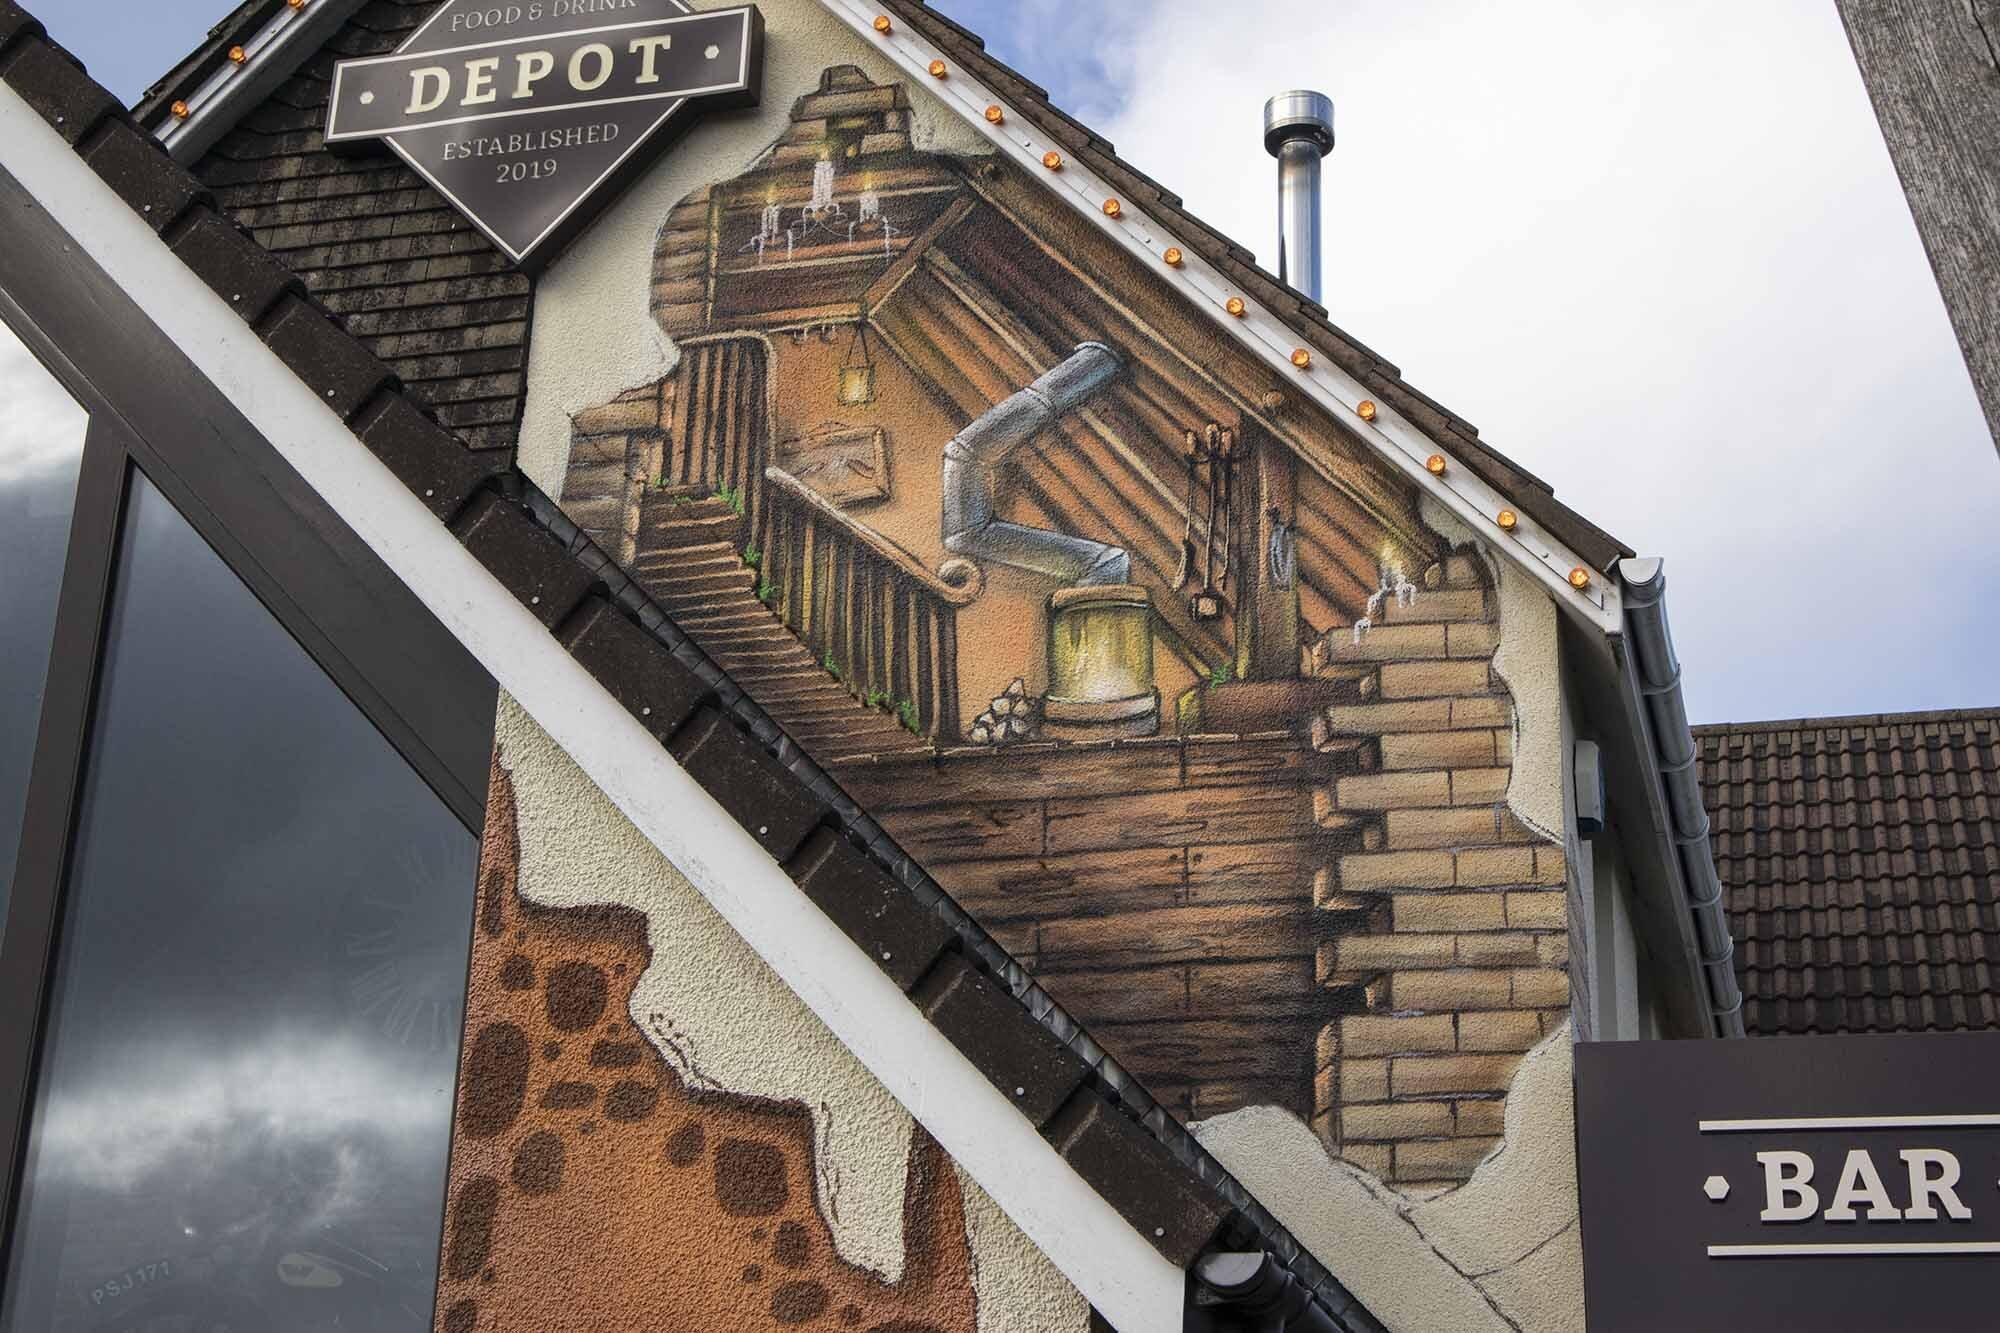 Depot Trompe L'oeil Architectural Mural-front-closeup4